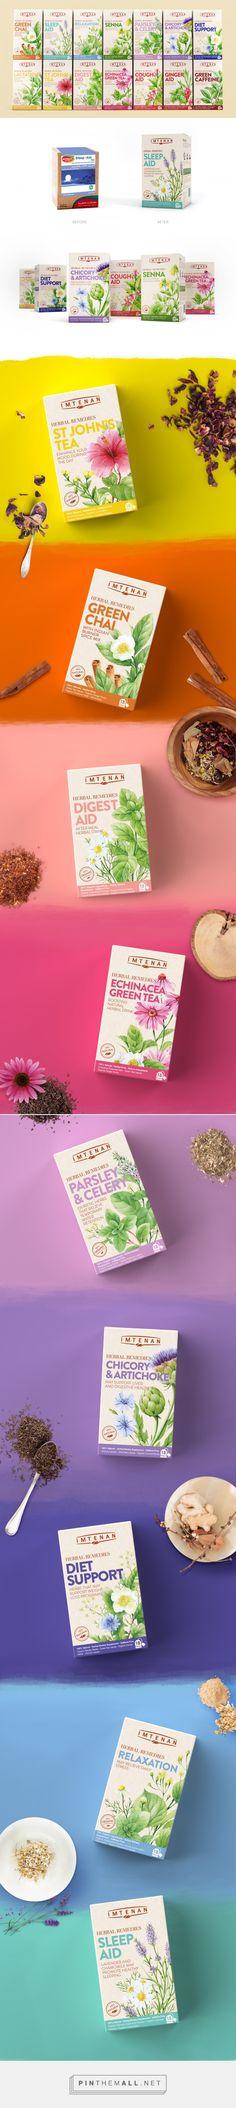 Imtenan Herbal Remedies — The Dieline - Branding & Packaging - created via http://pinthemall.net